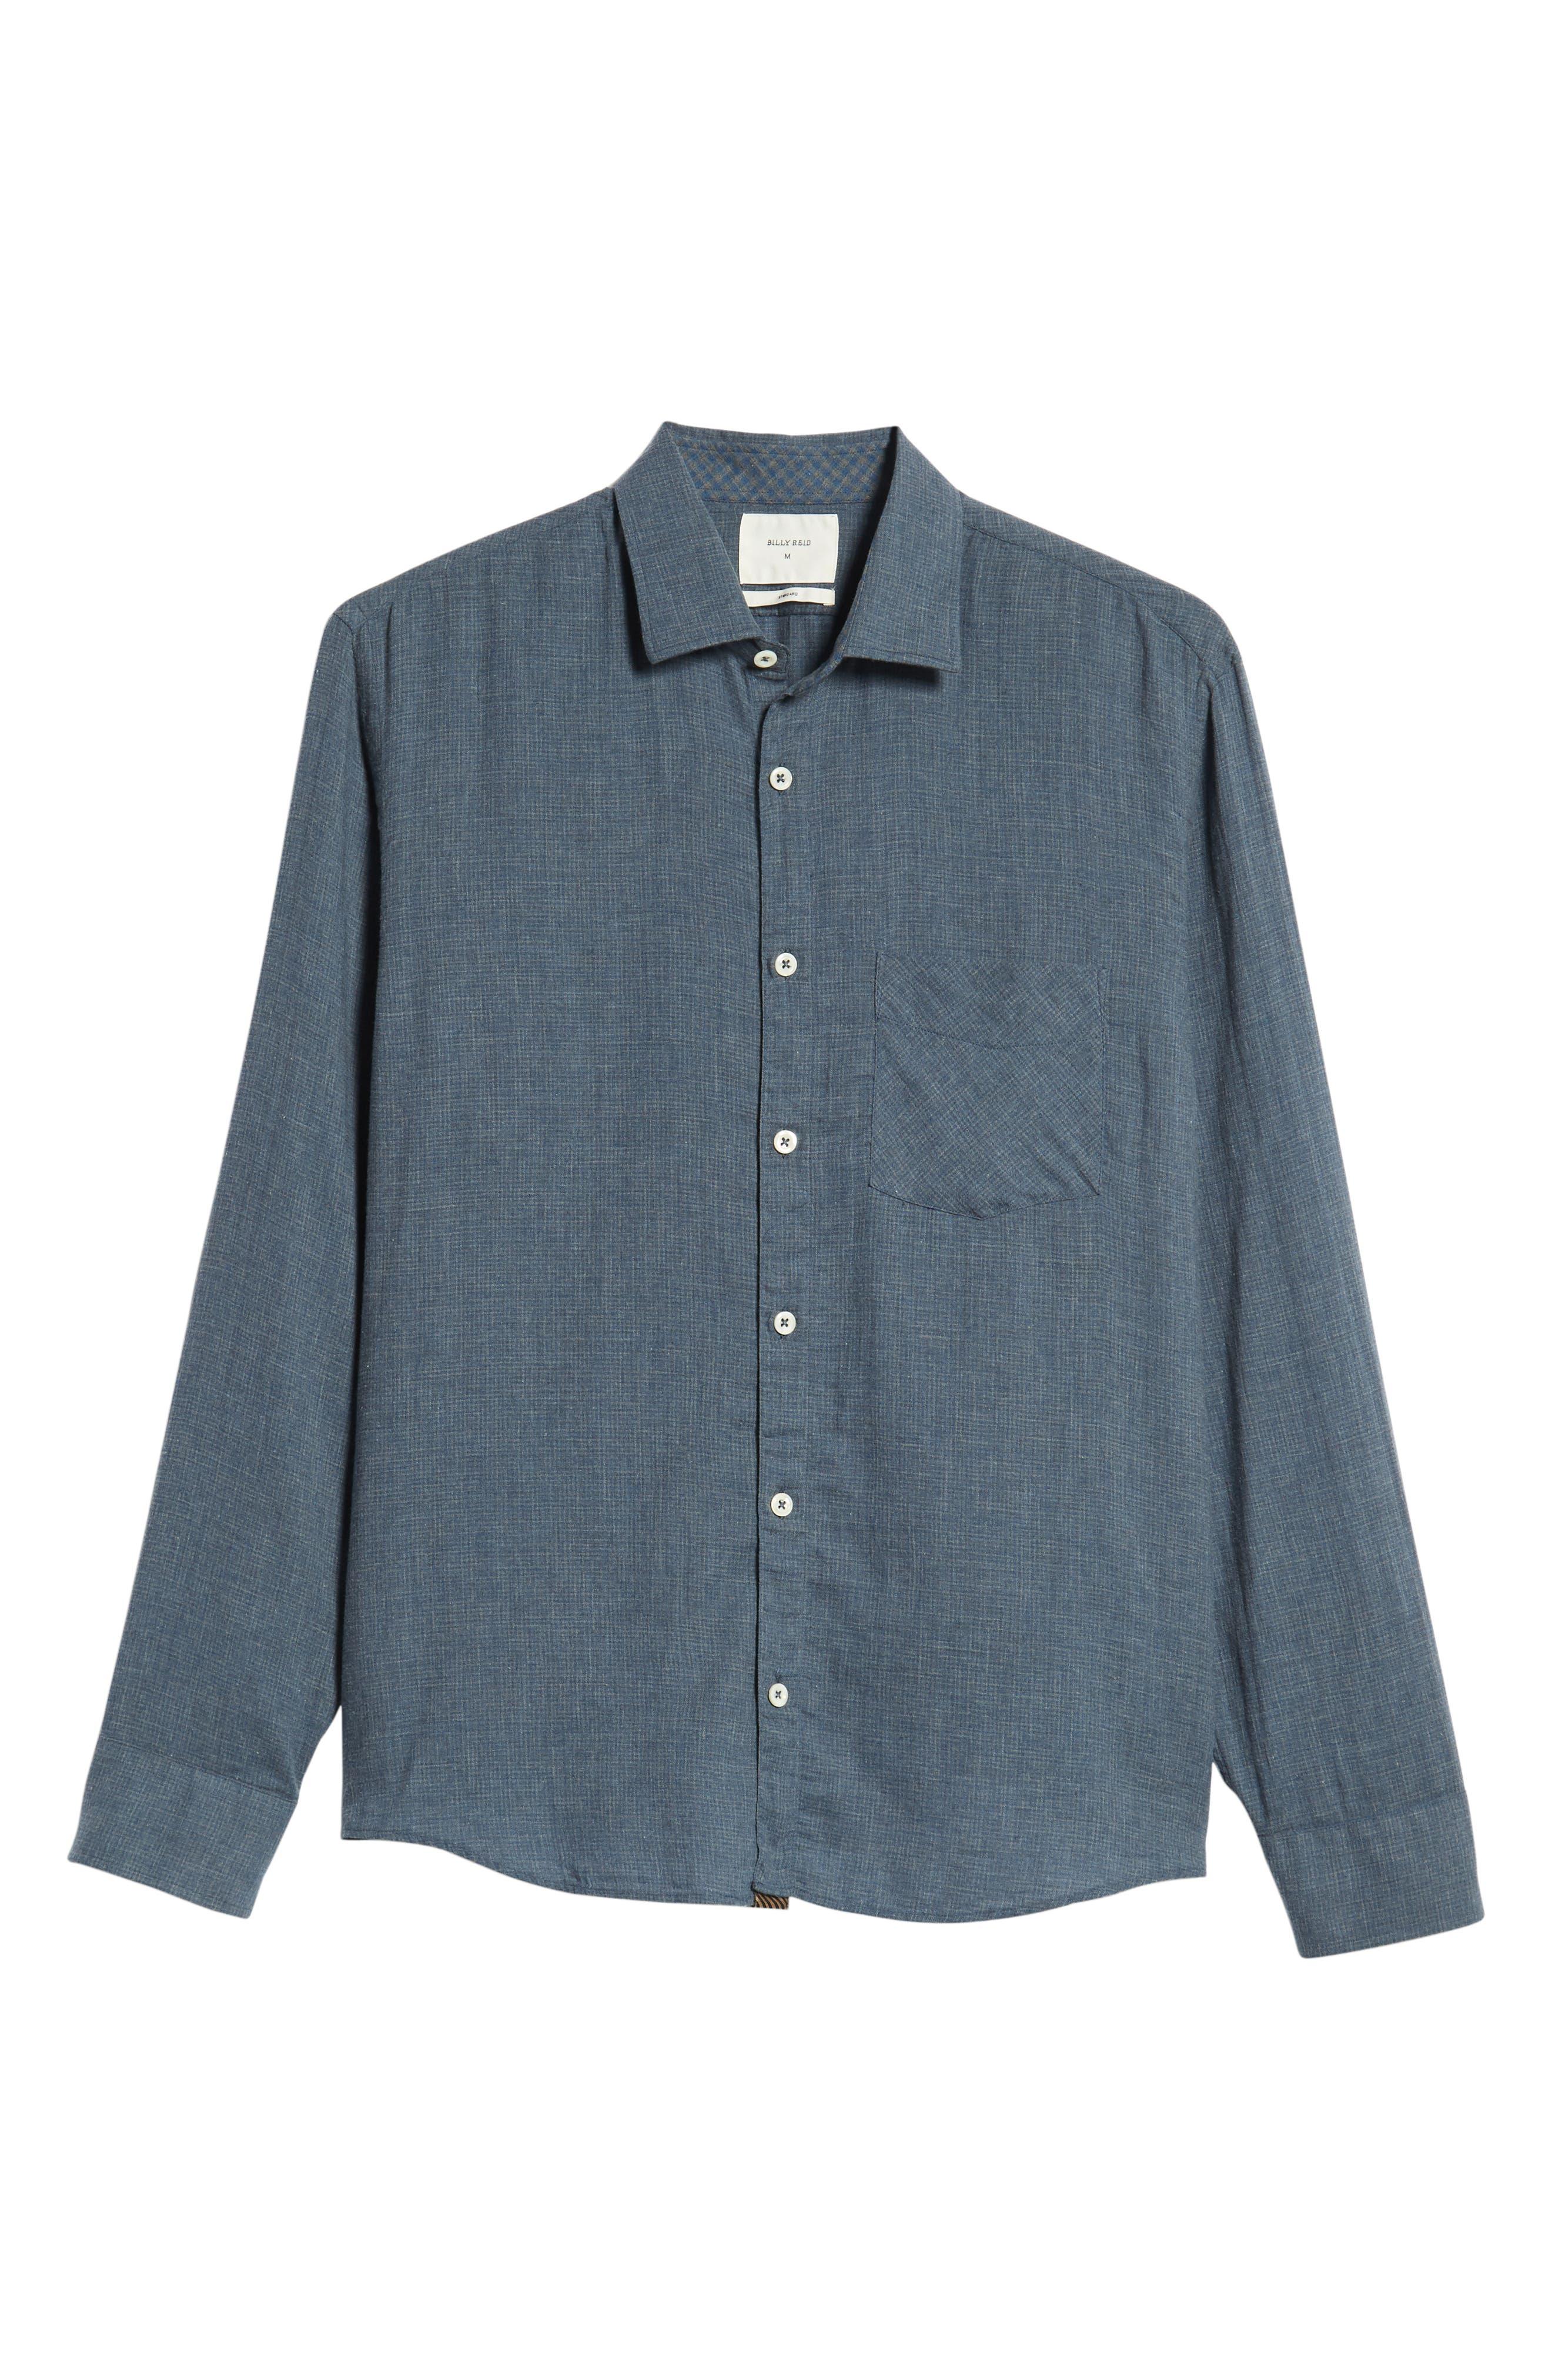 John Regular Fit Sport Shirt,                             Alternate thumbnail 6, color,                             420